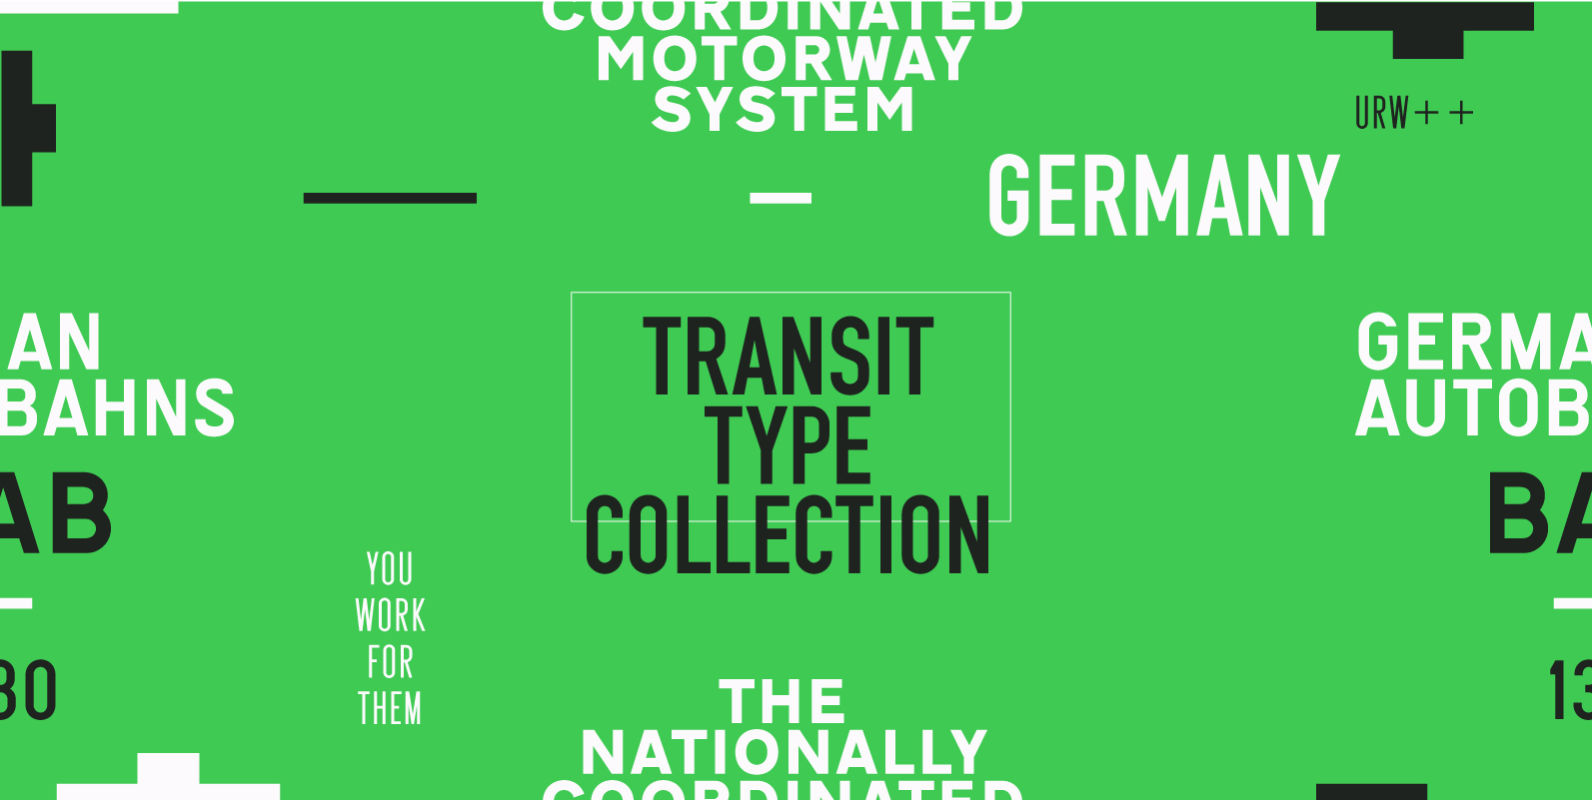 URW Transit Type Collection